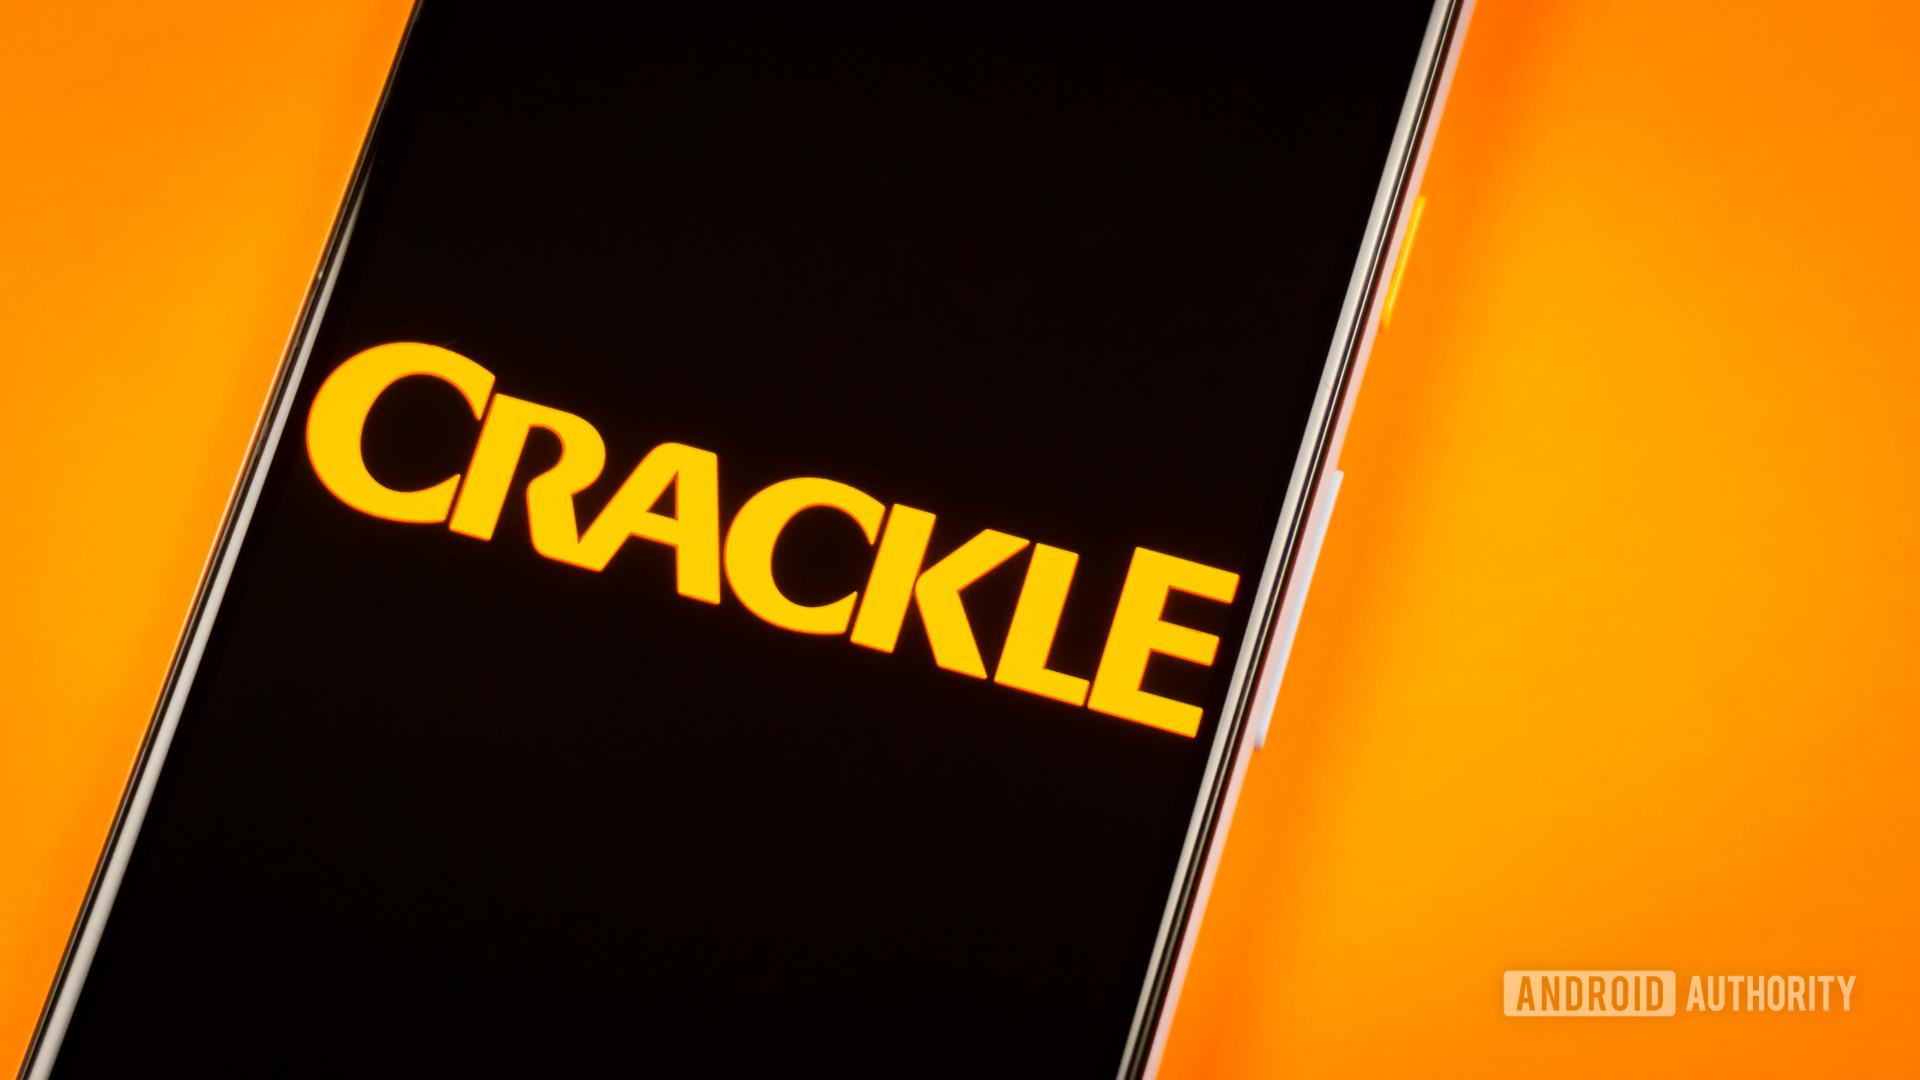 Crackle stock photo 2